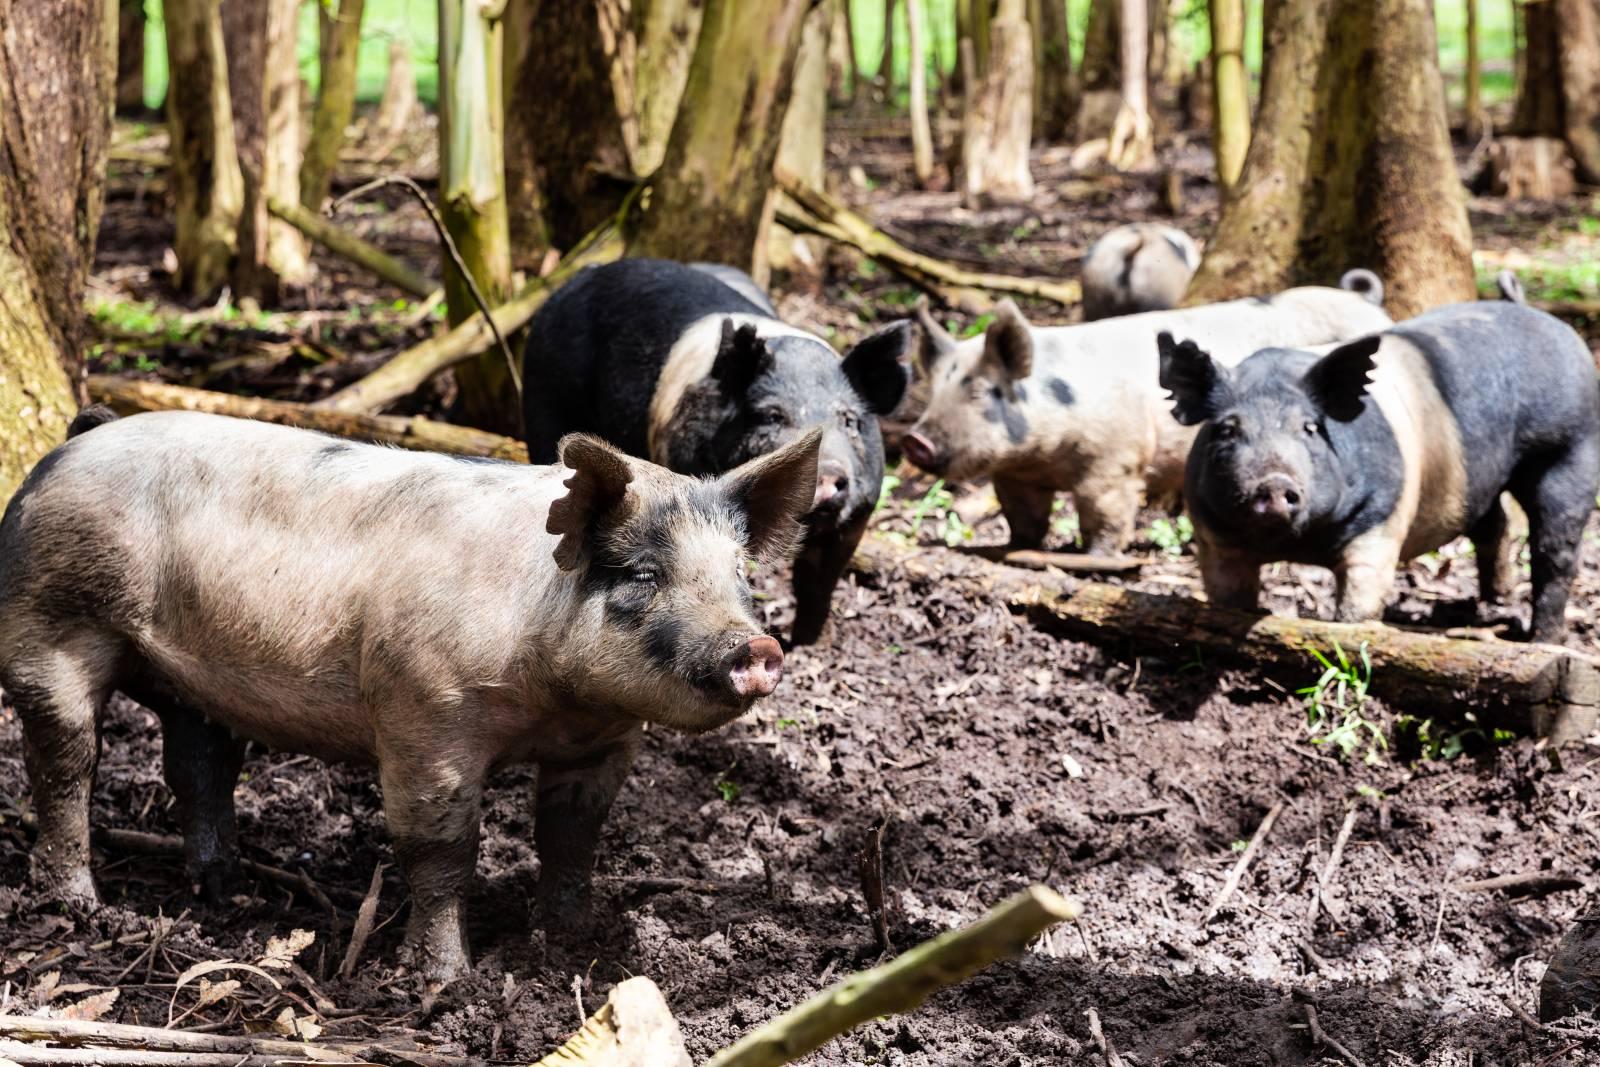 stemple-creek-ranch-berkshire-pigs.jpg